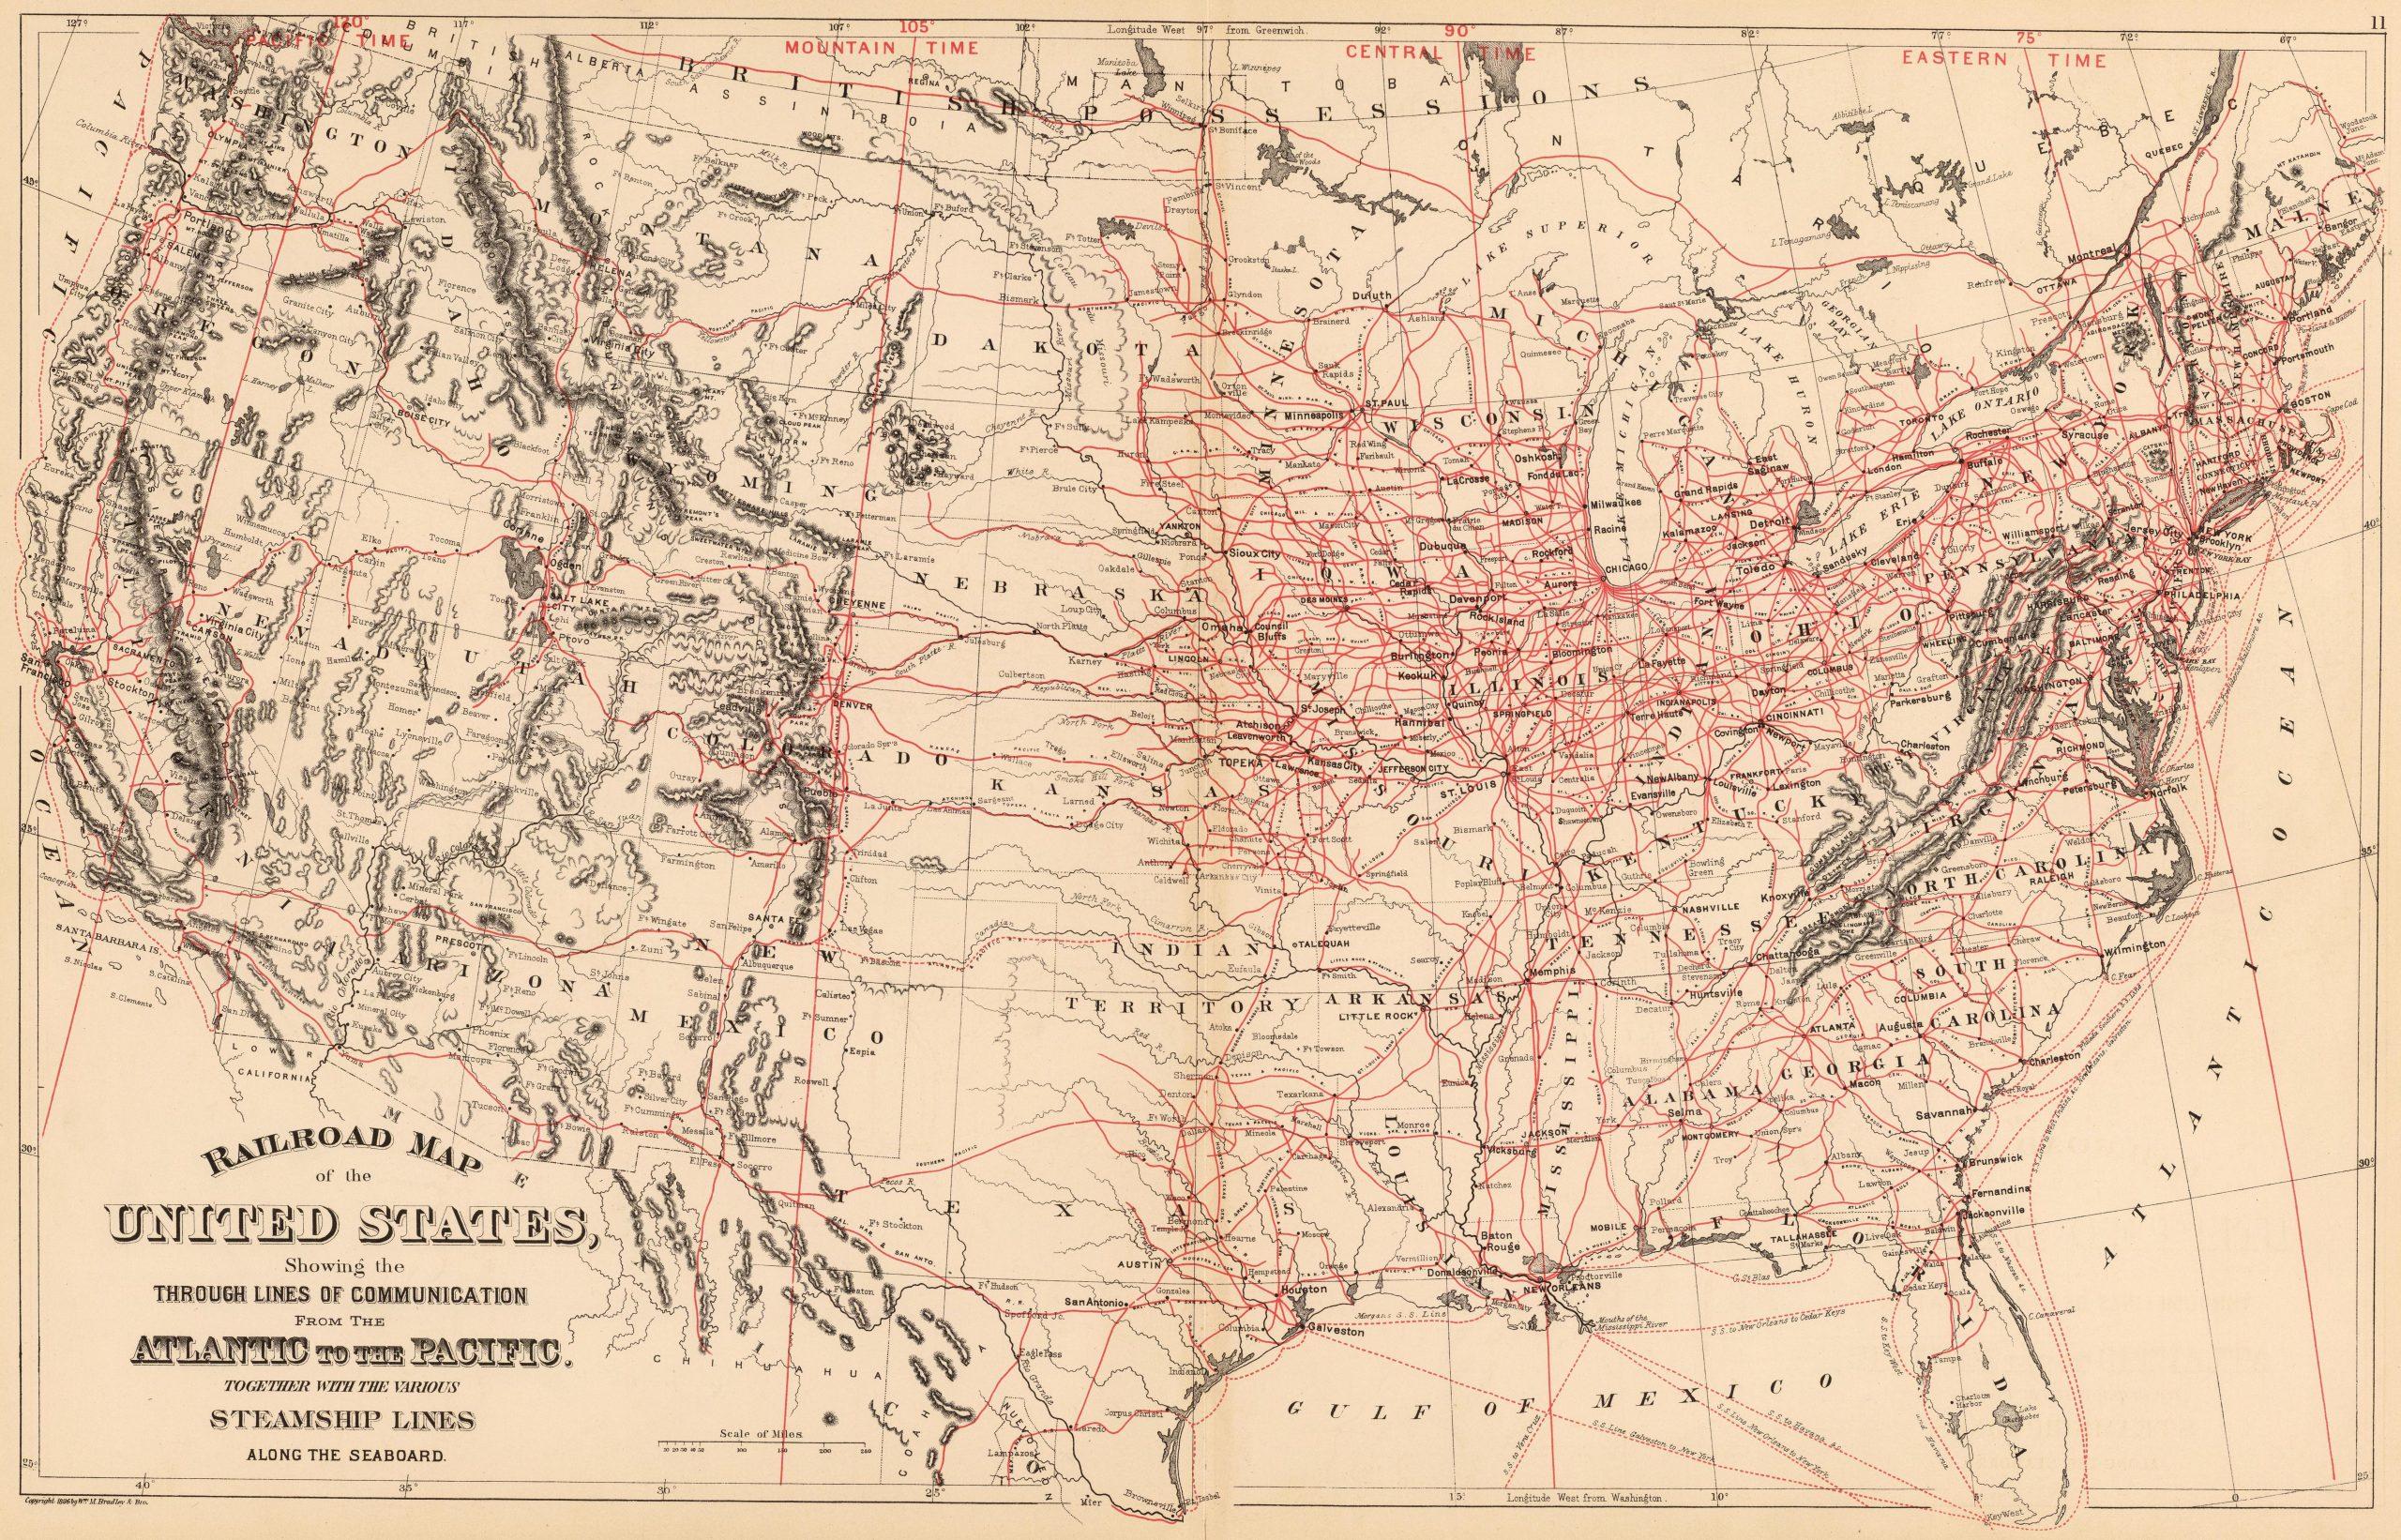 1886 Railroad map